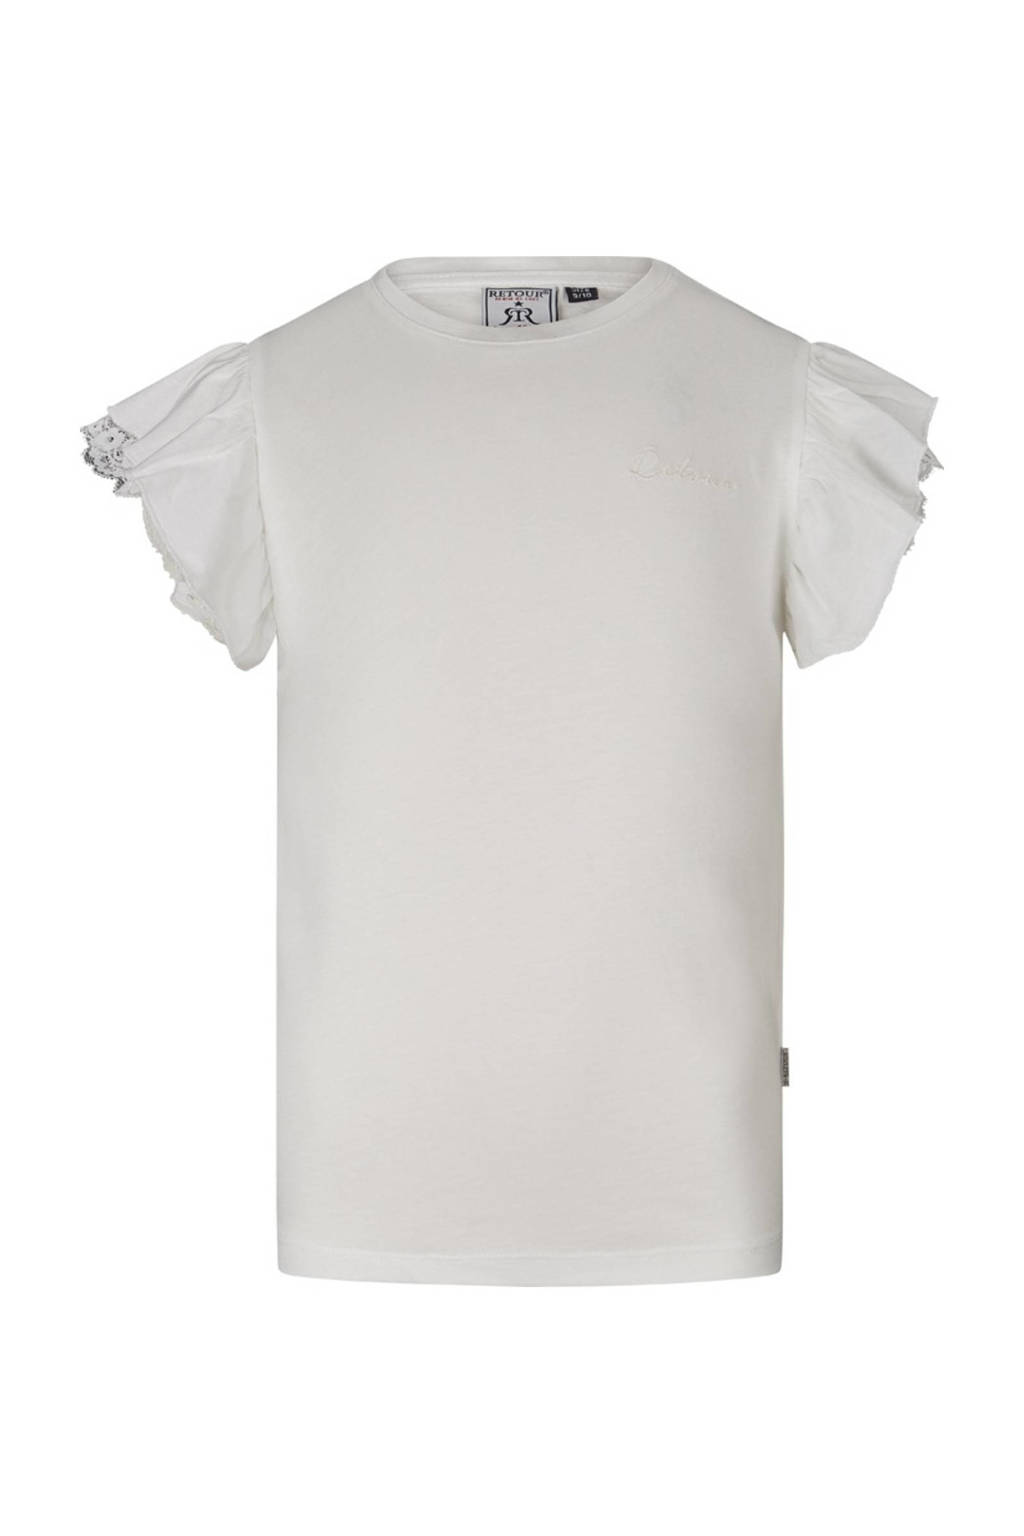 Retour Denim T-shirt Hanna met borduursels off white, Off White